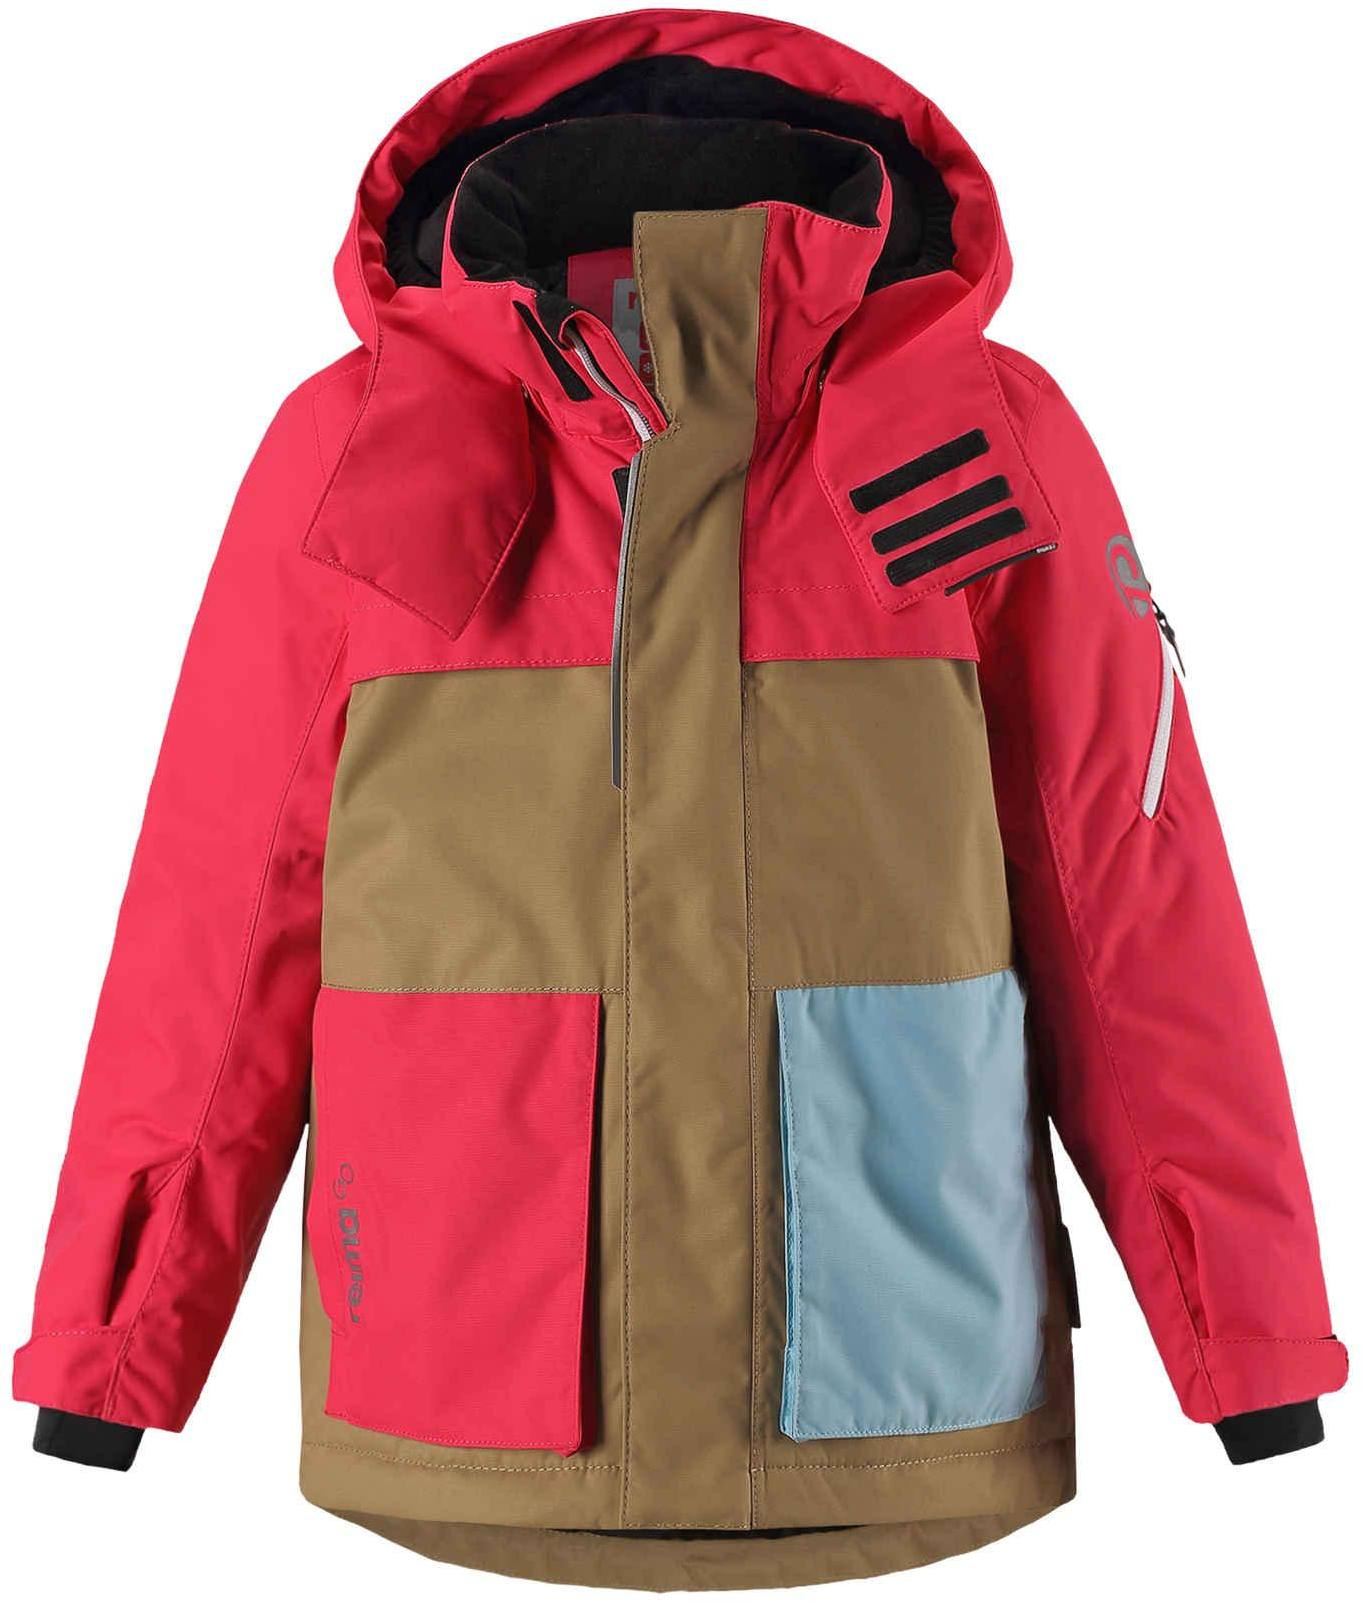 0a9dfe8ac4a Reima Rondane Jacket